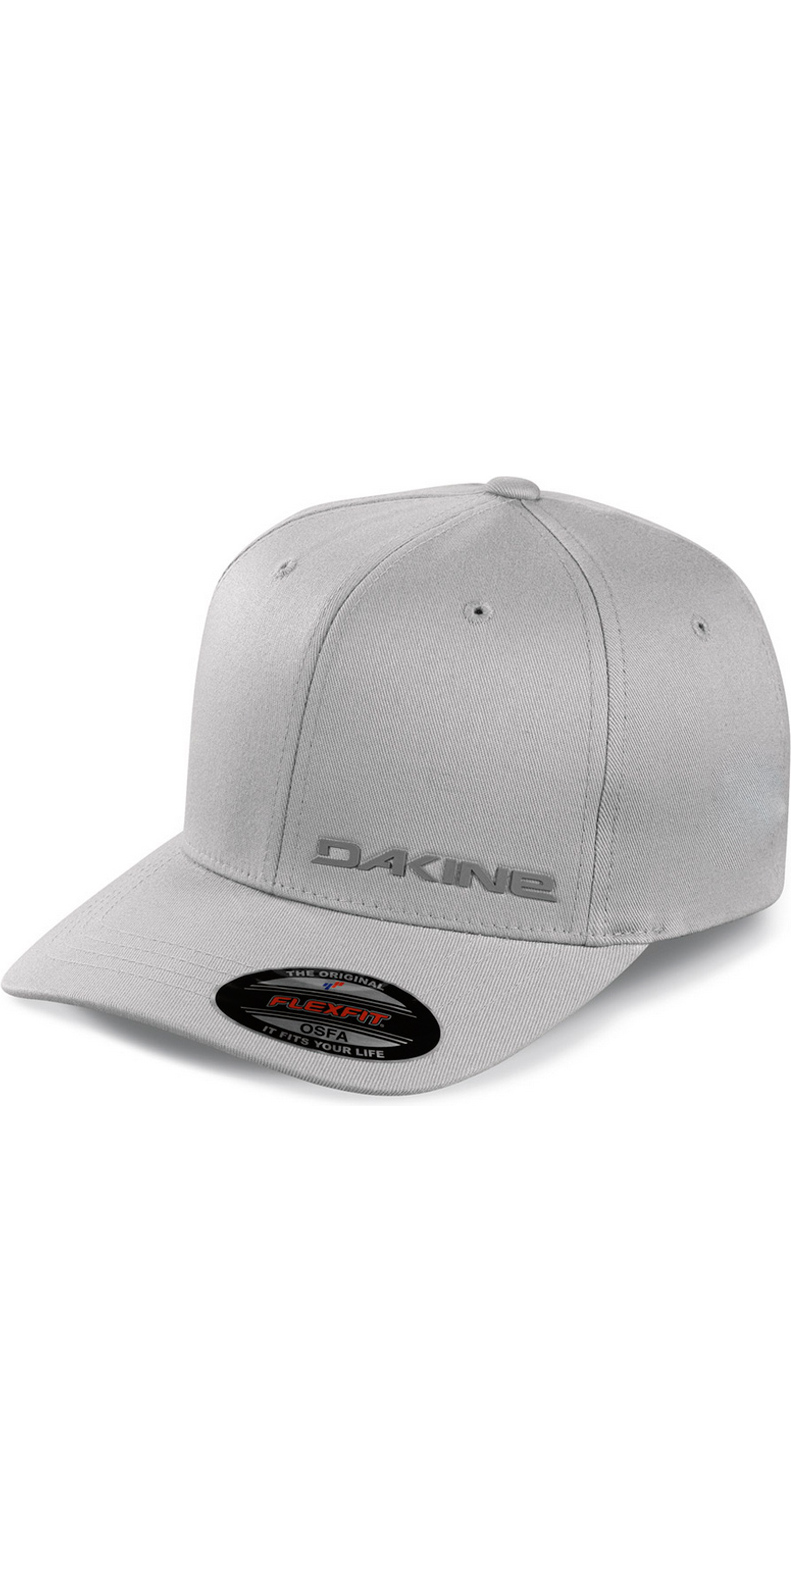 563c5cac106 2018 Dakine Silicone Rail Flexfit Cap in Grey 08640040 - 08640040 ...